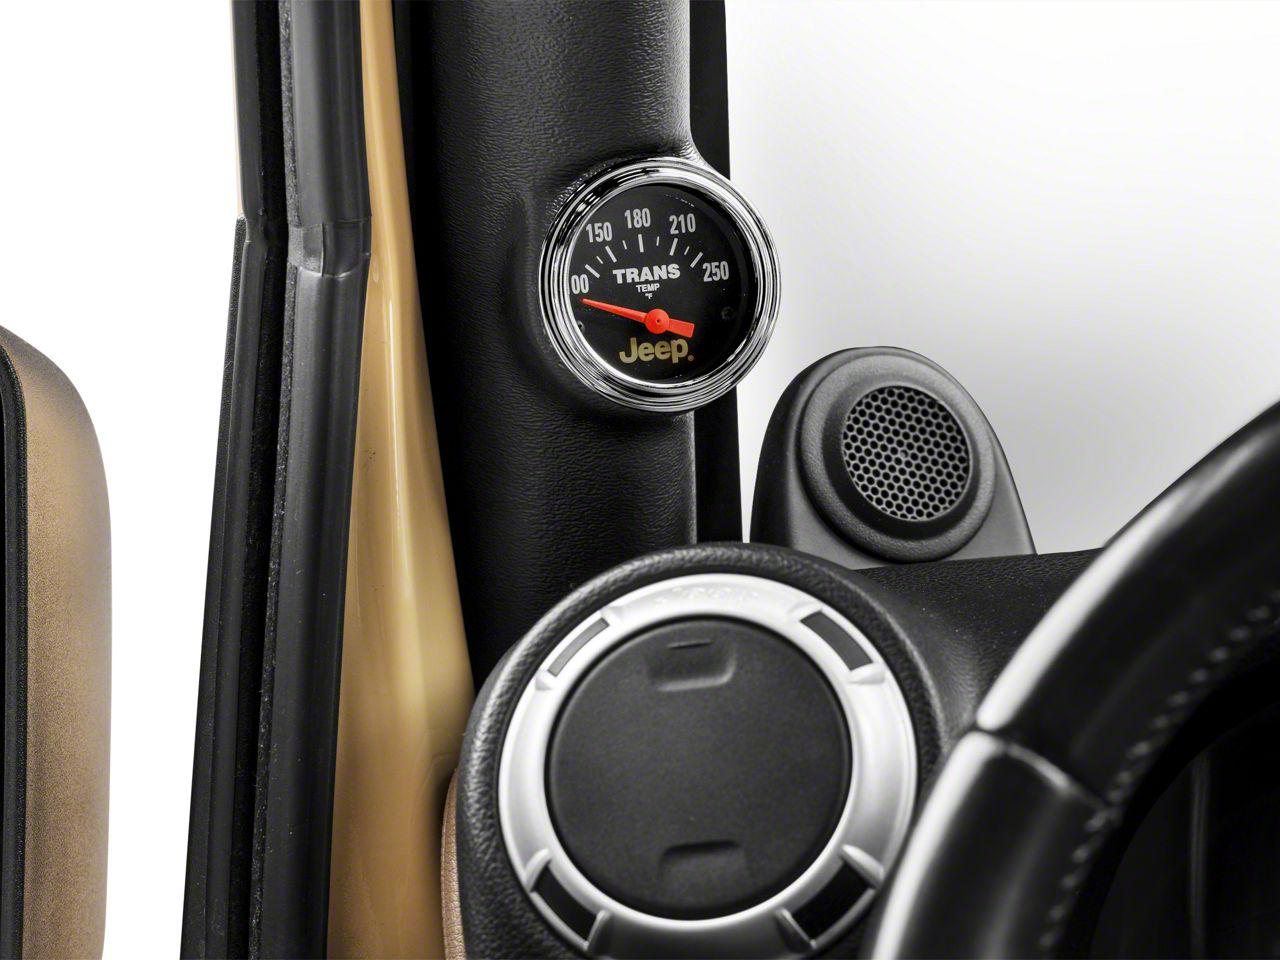 Auto Meter Transmission Temperature Gauge - Electrical - Jeep Logo (87-18 Jeep Wrangler YJ, TJ, JK & JL)